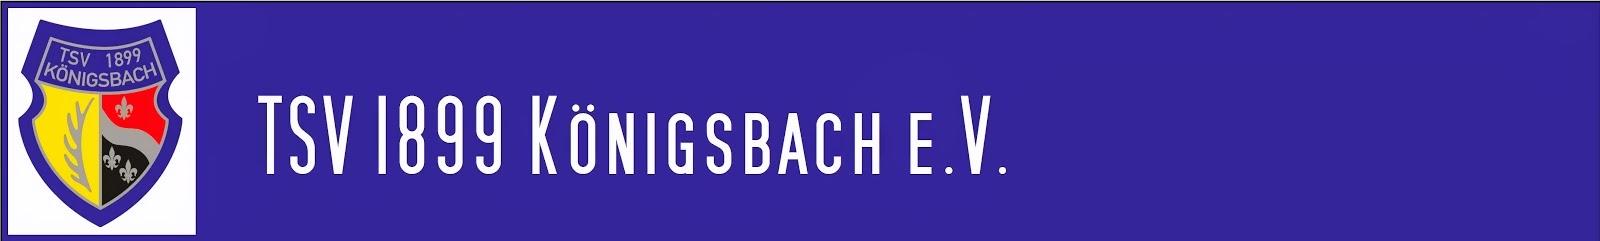 TSV 1899 Königsbach